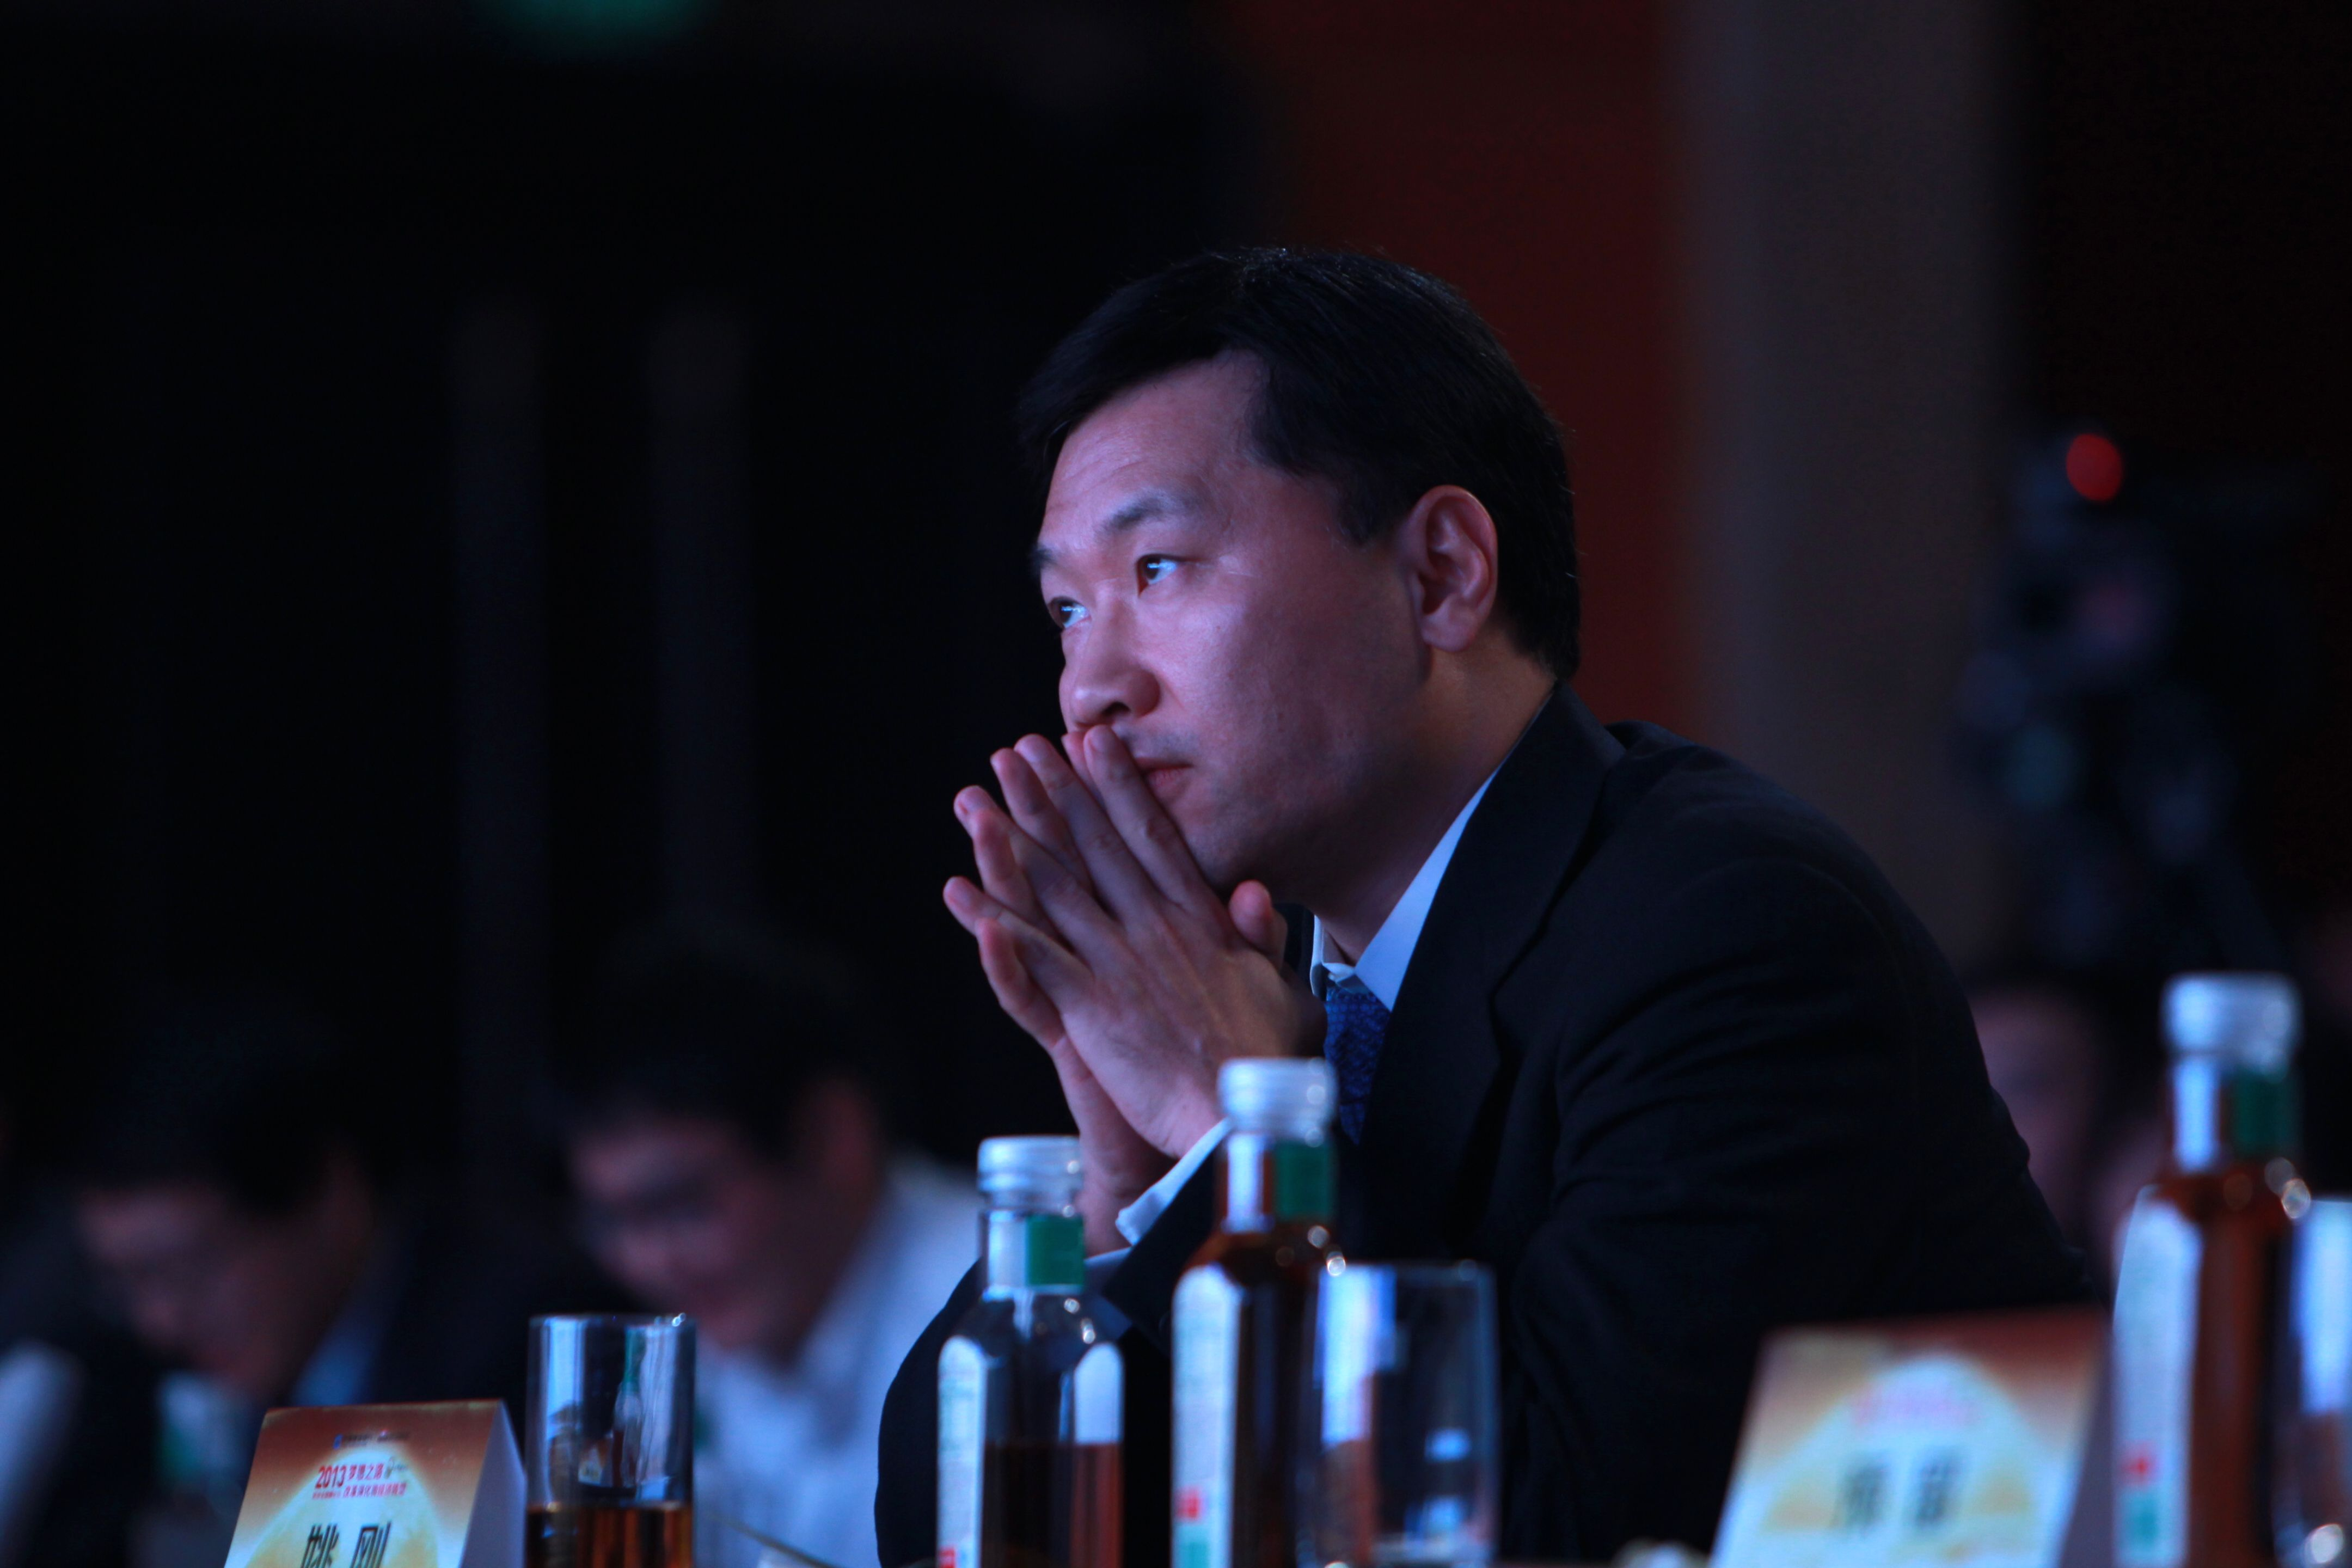 China's No.2 Stock Regulator Investigated For Corruption